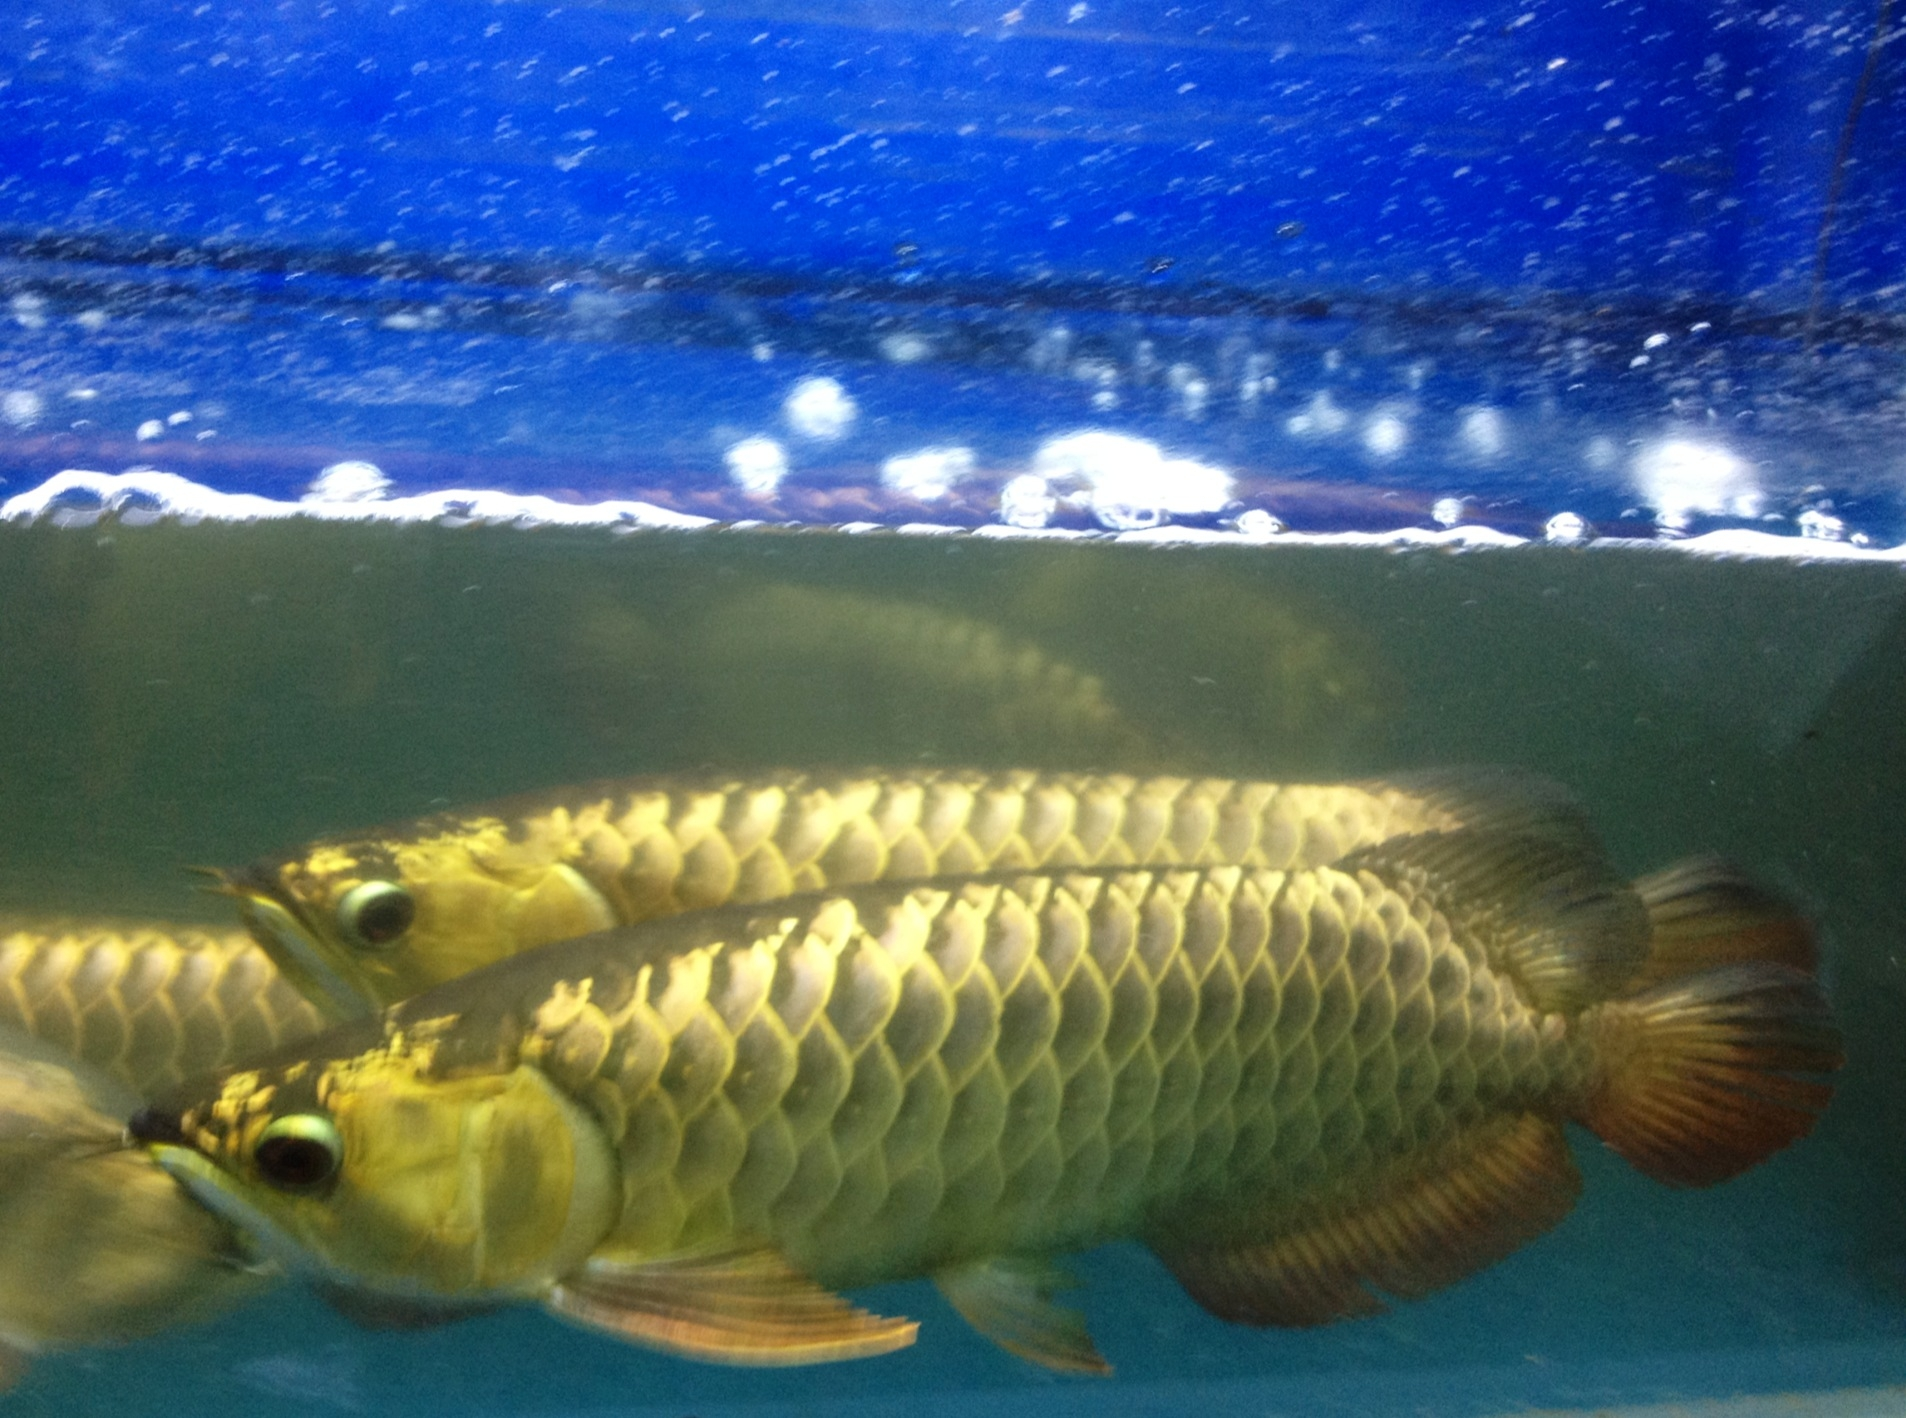 Marugen koi farm a boutique japanese koi fish farm for Baby carp for sale